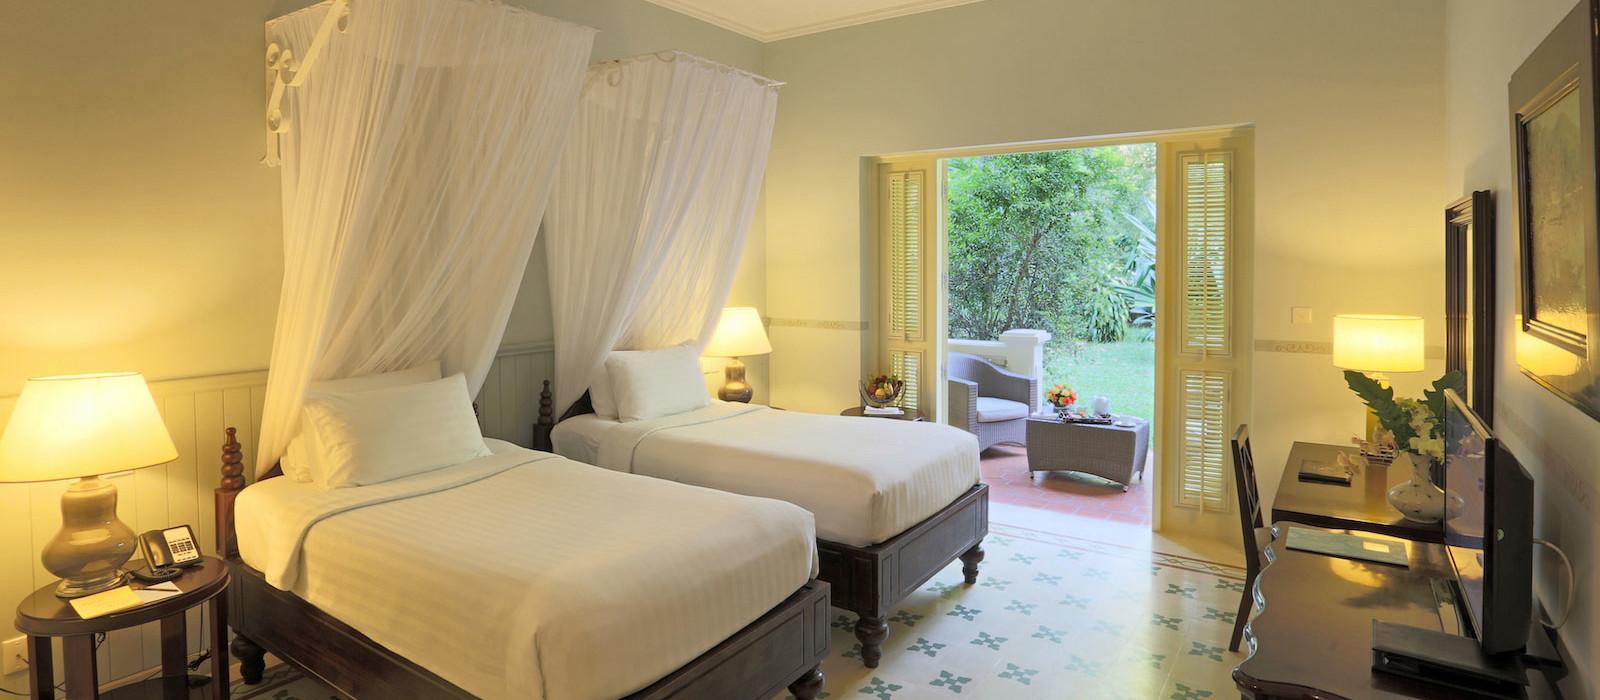 Hotel La Veranda Resort Vietnam